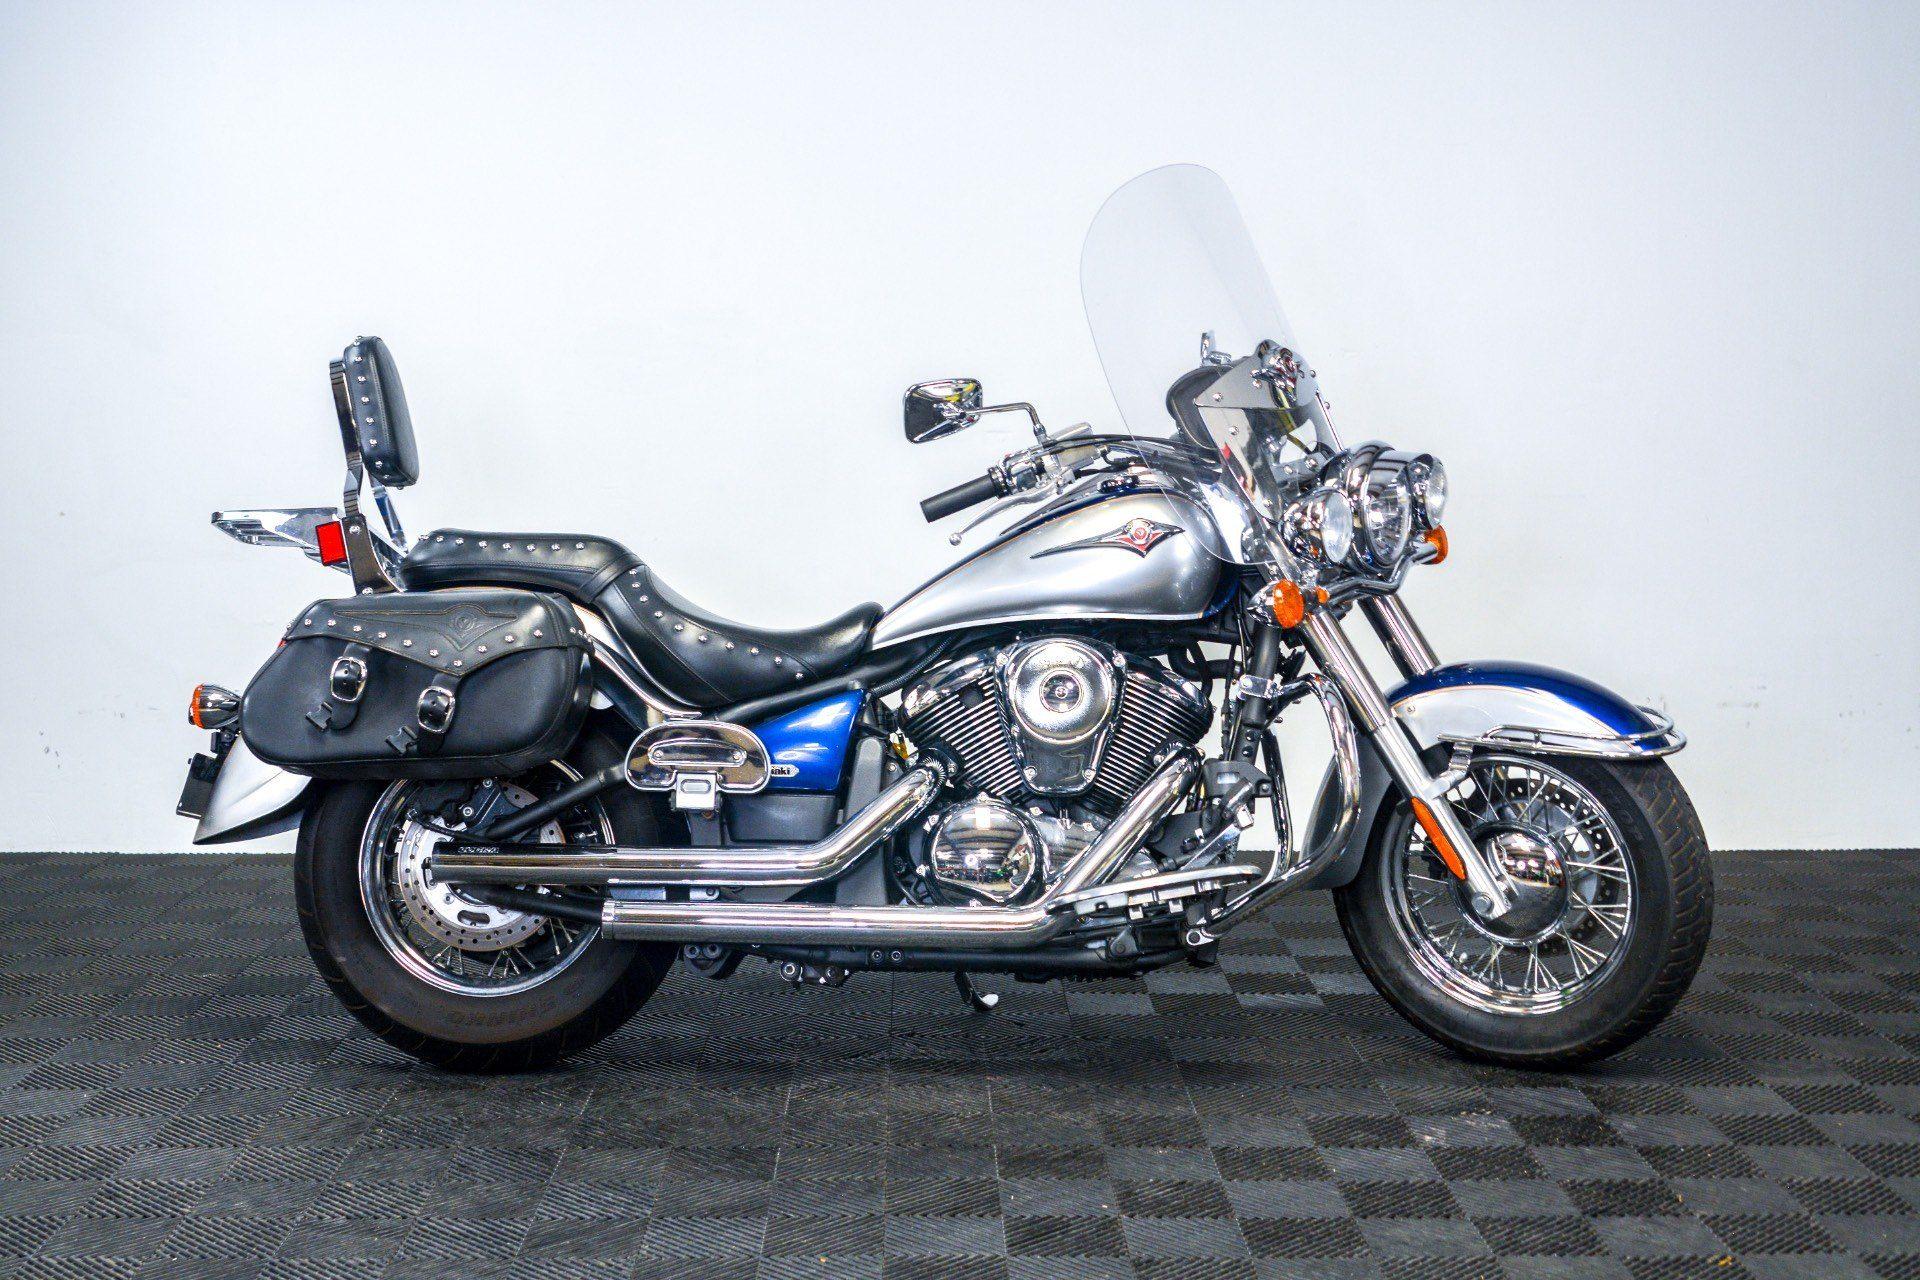 Used 2008 Kawasaki Vulcan® 900 Classic LT Motorcycles in Oklahoma ...